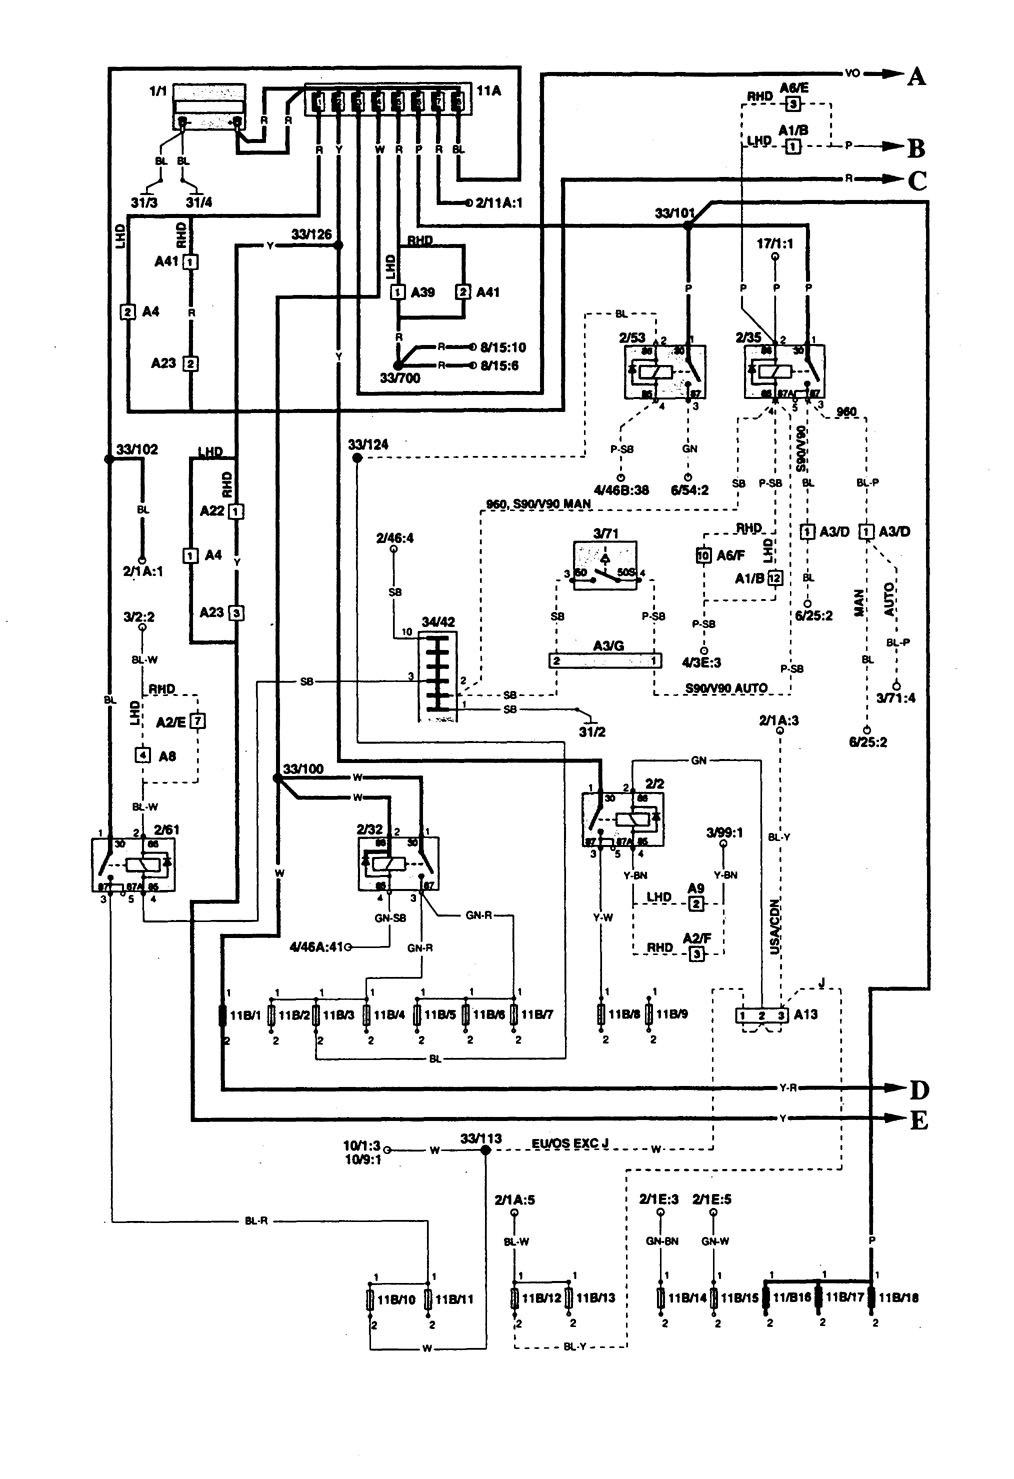 volvo 960  1997  - wiring diagrams - power distribution